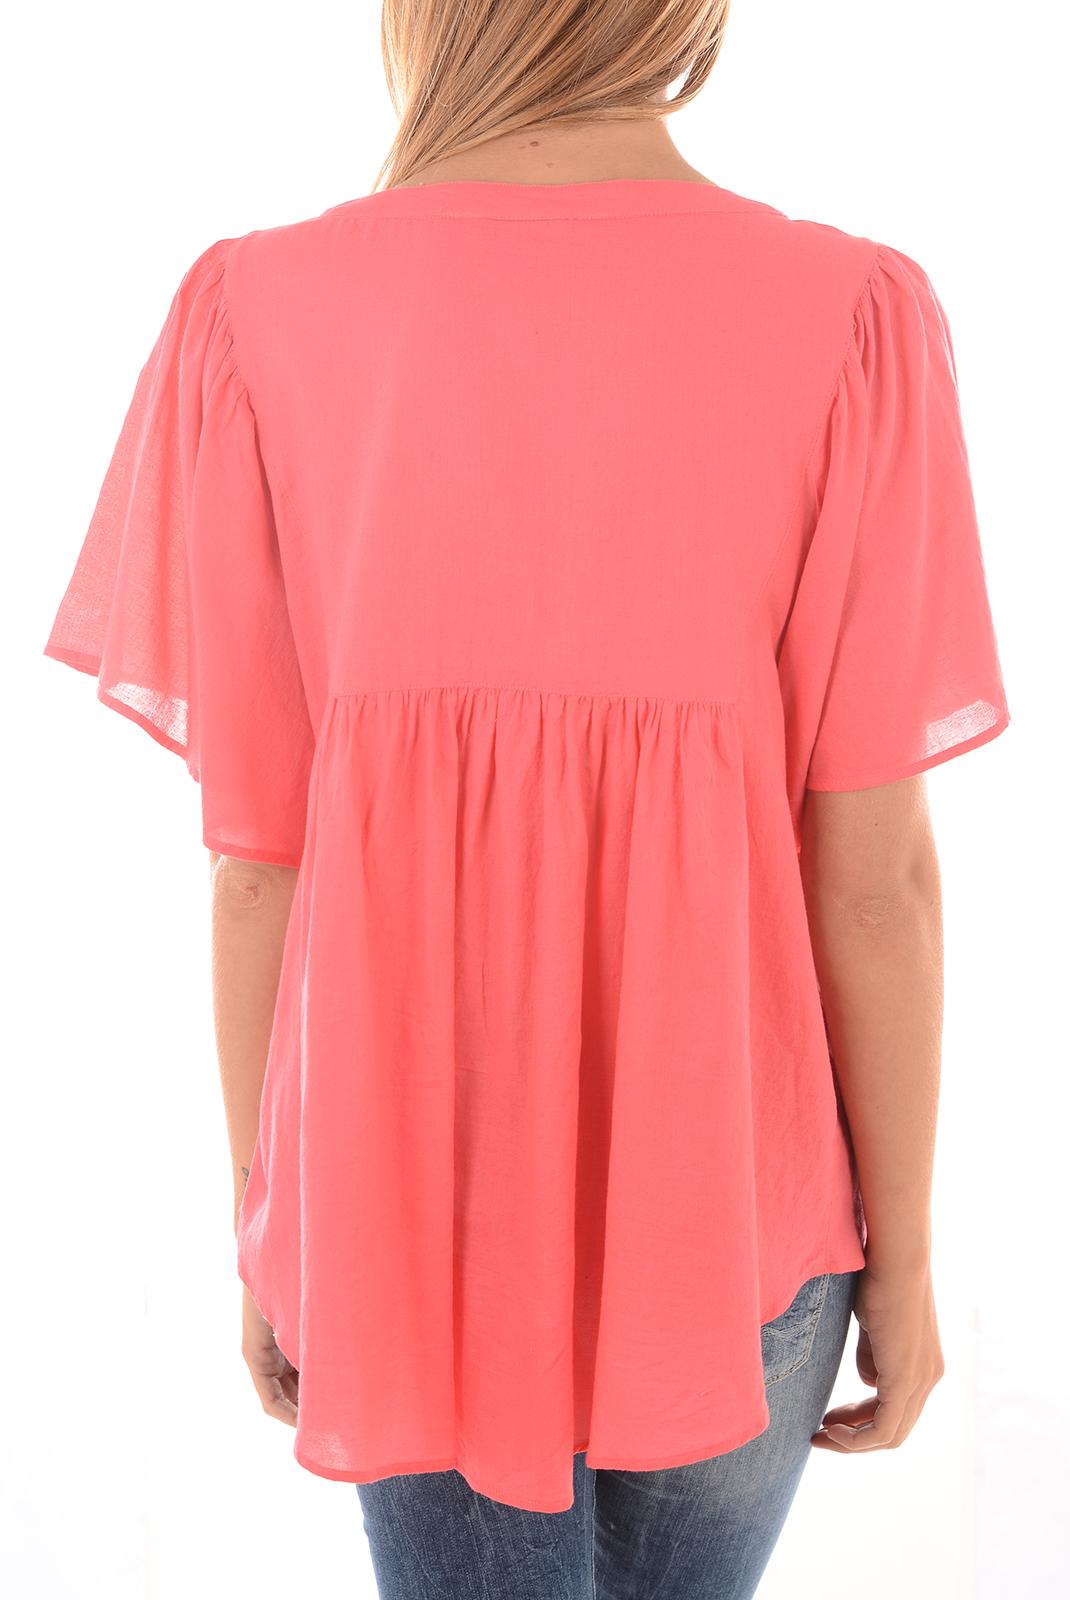 Tops & Tee shirts  Vero moda HUSSA SS TOP ROUGE RED